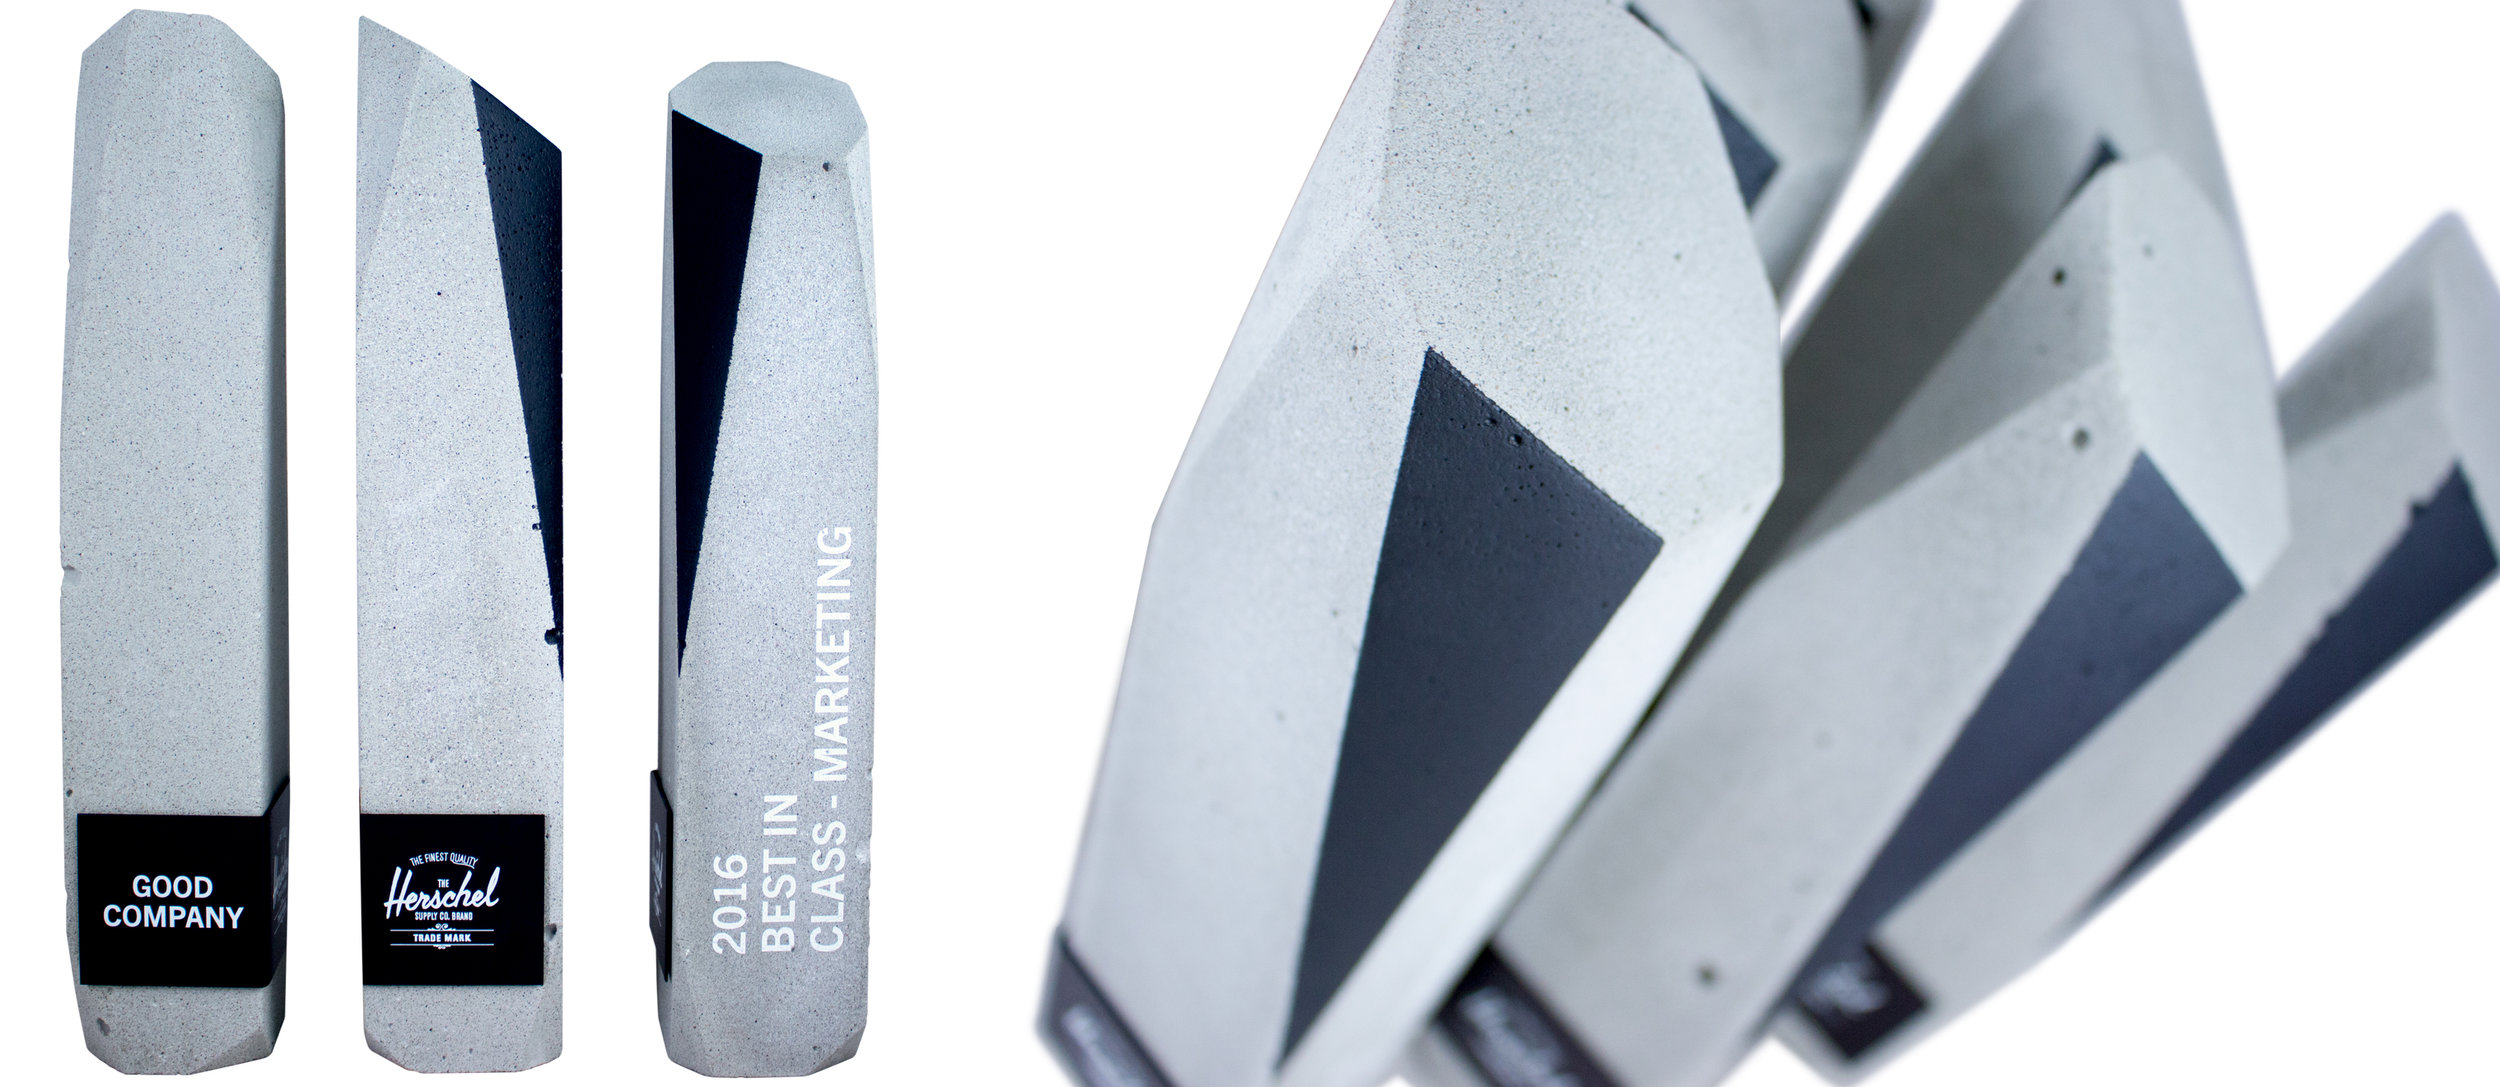 herschel new york inspired trophies modern concrete